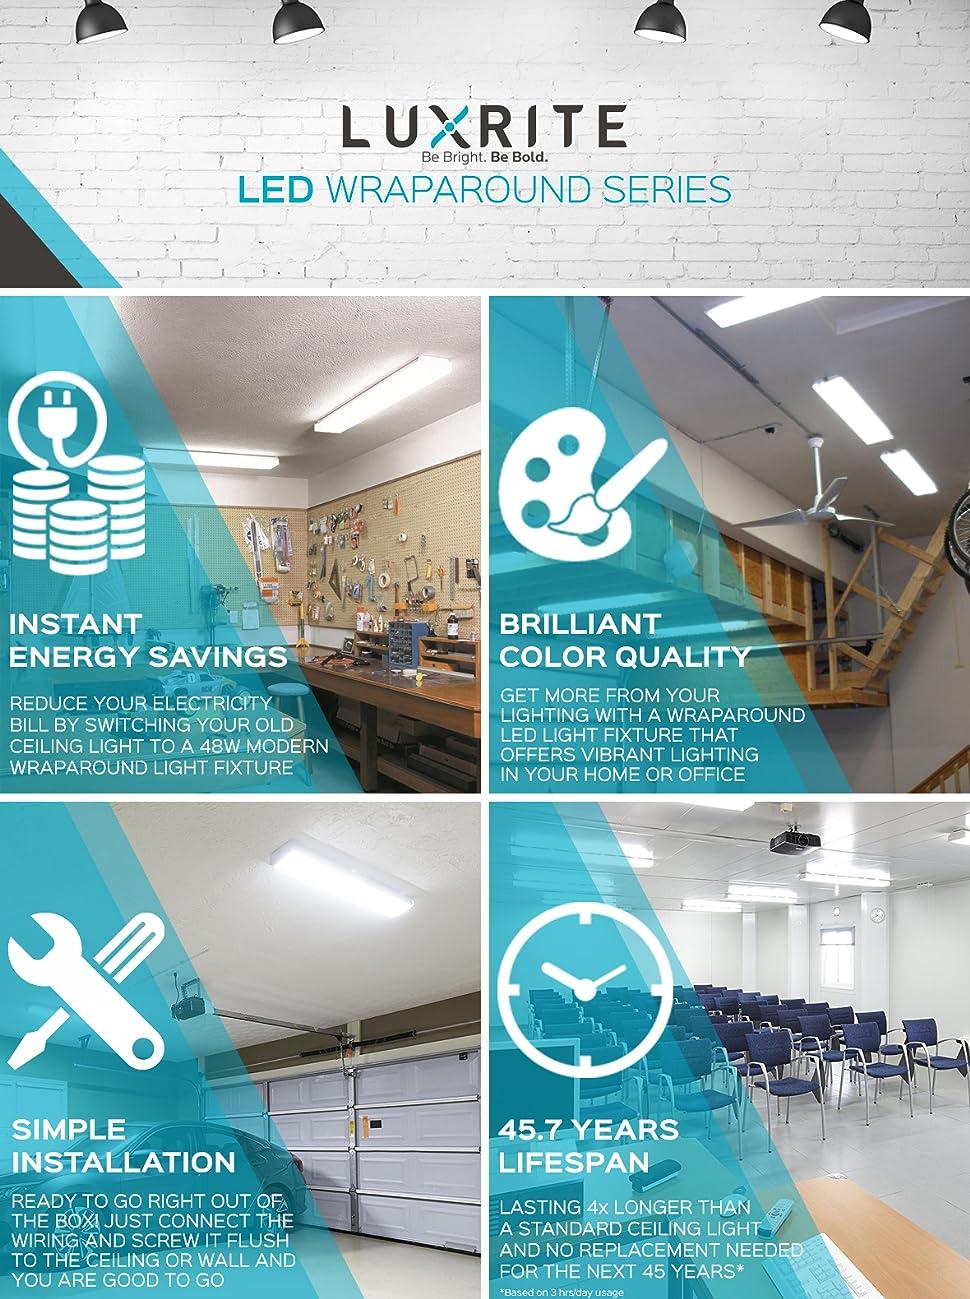 Luxrite 4ft Led Shop Lights For Garage Wrap Around 5040 Lumens Wiring In A Home Wraparound Light Series